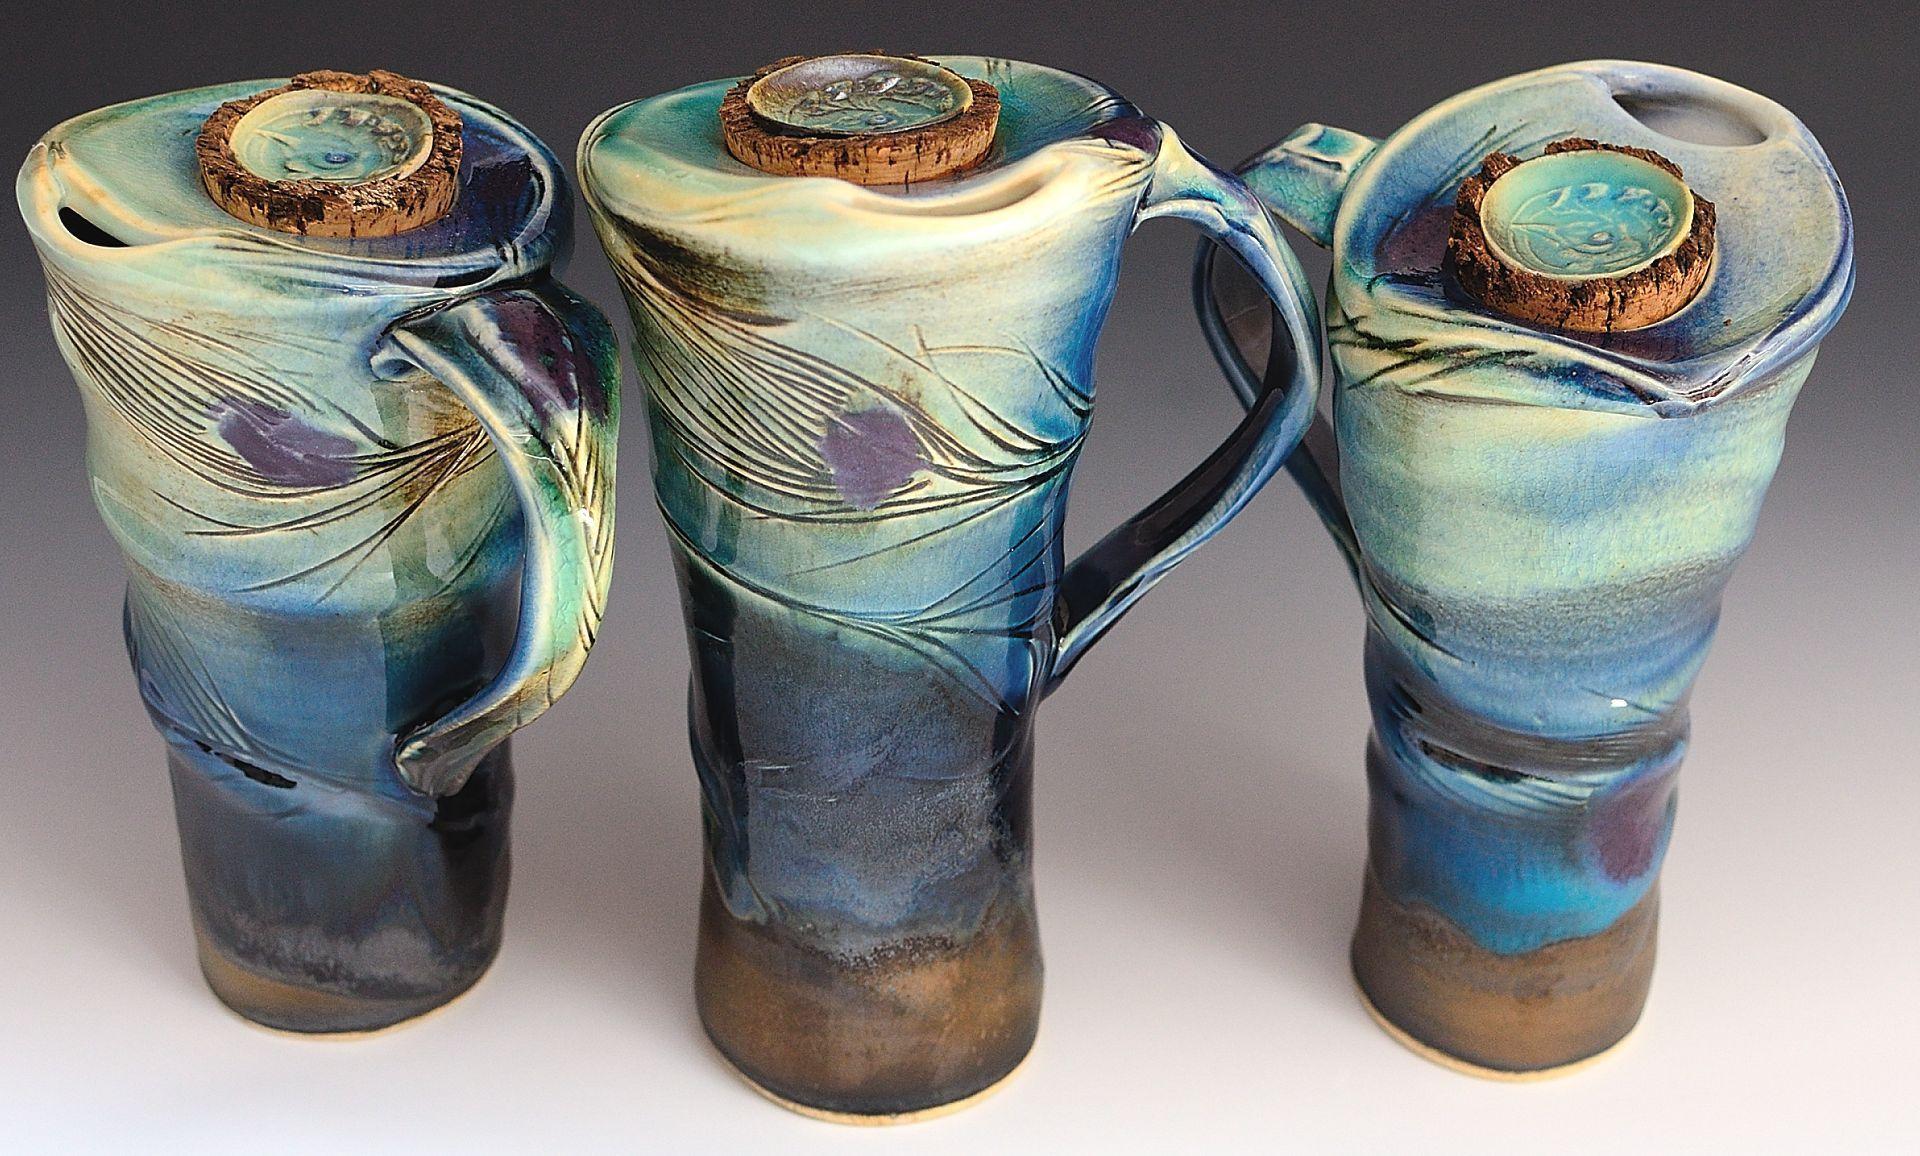 Handled Travel Mugs-Peacock series  Catherine Rehbein